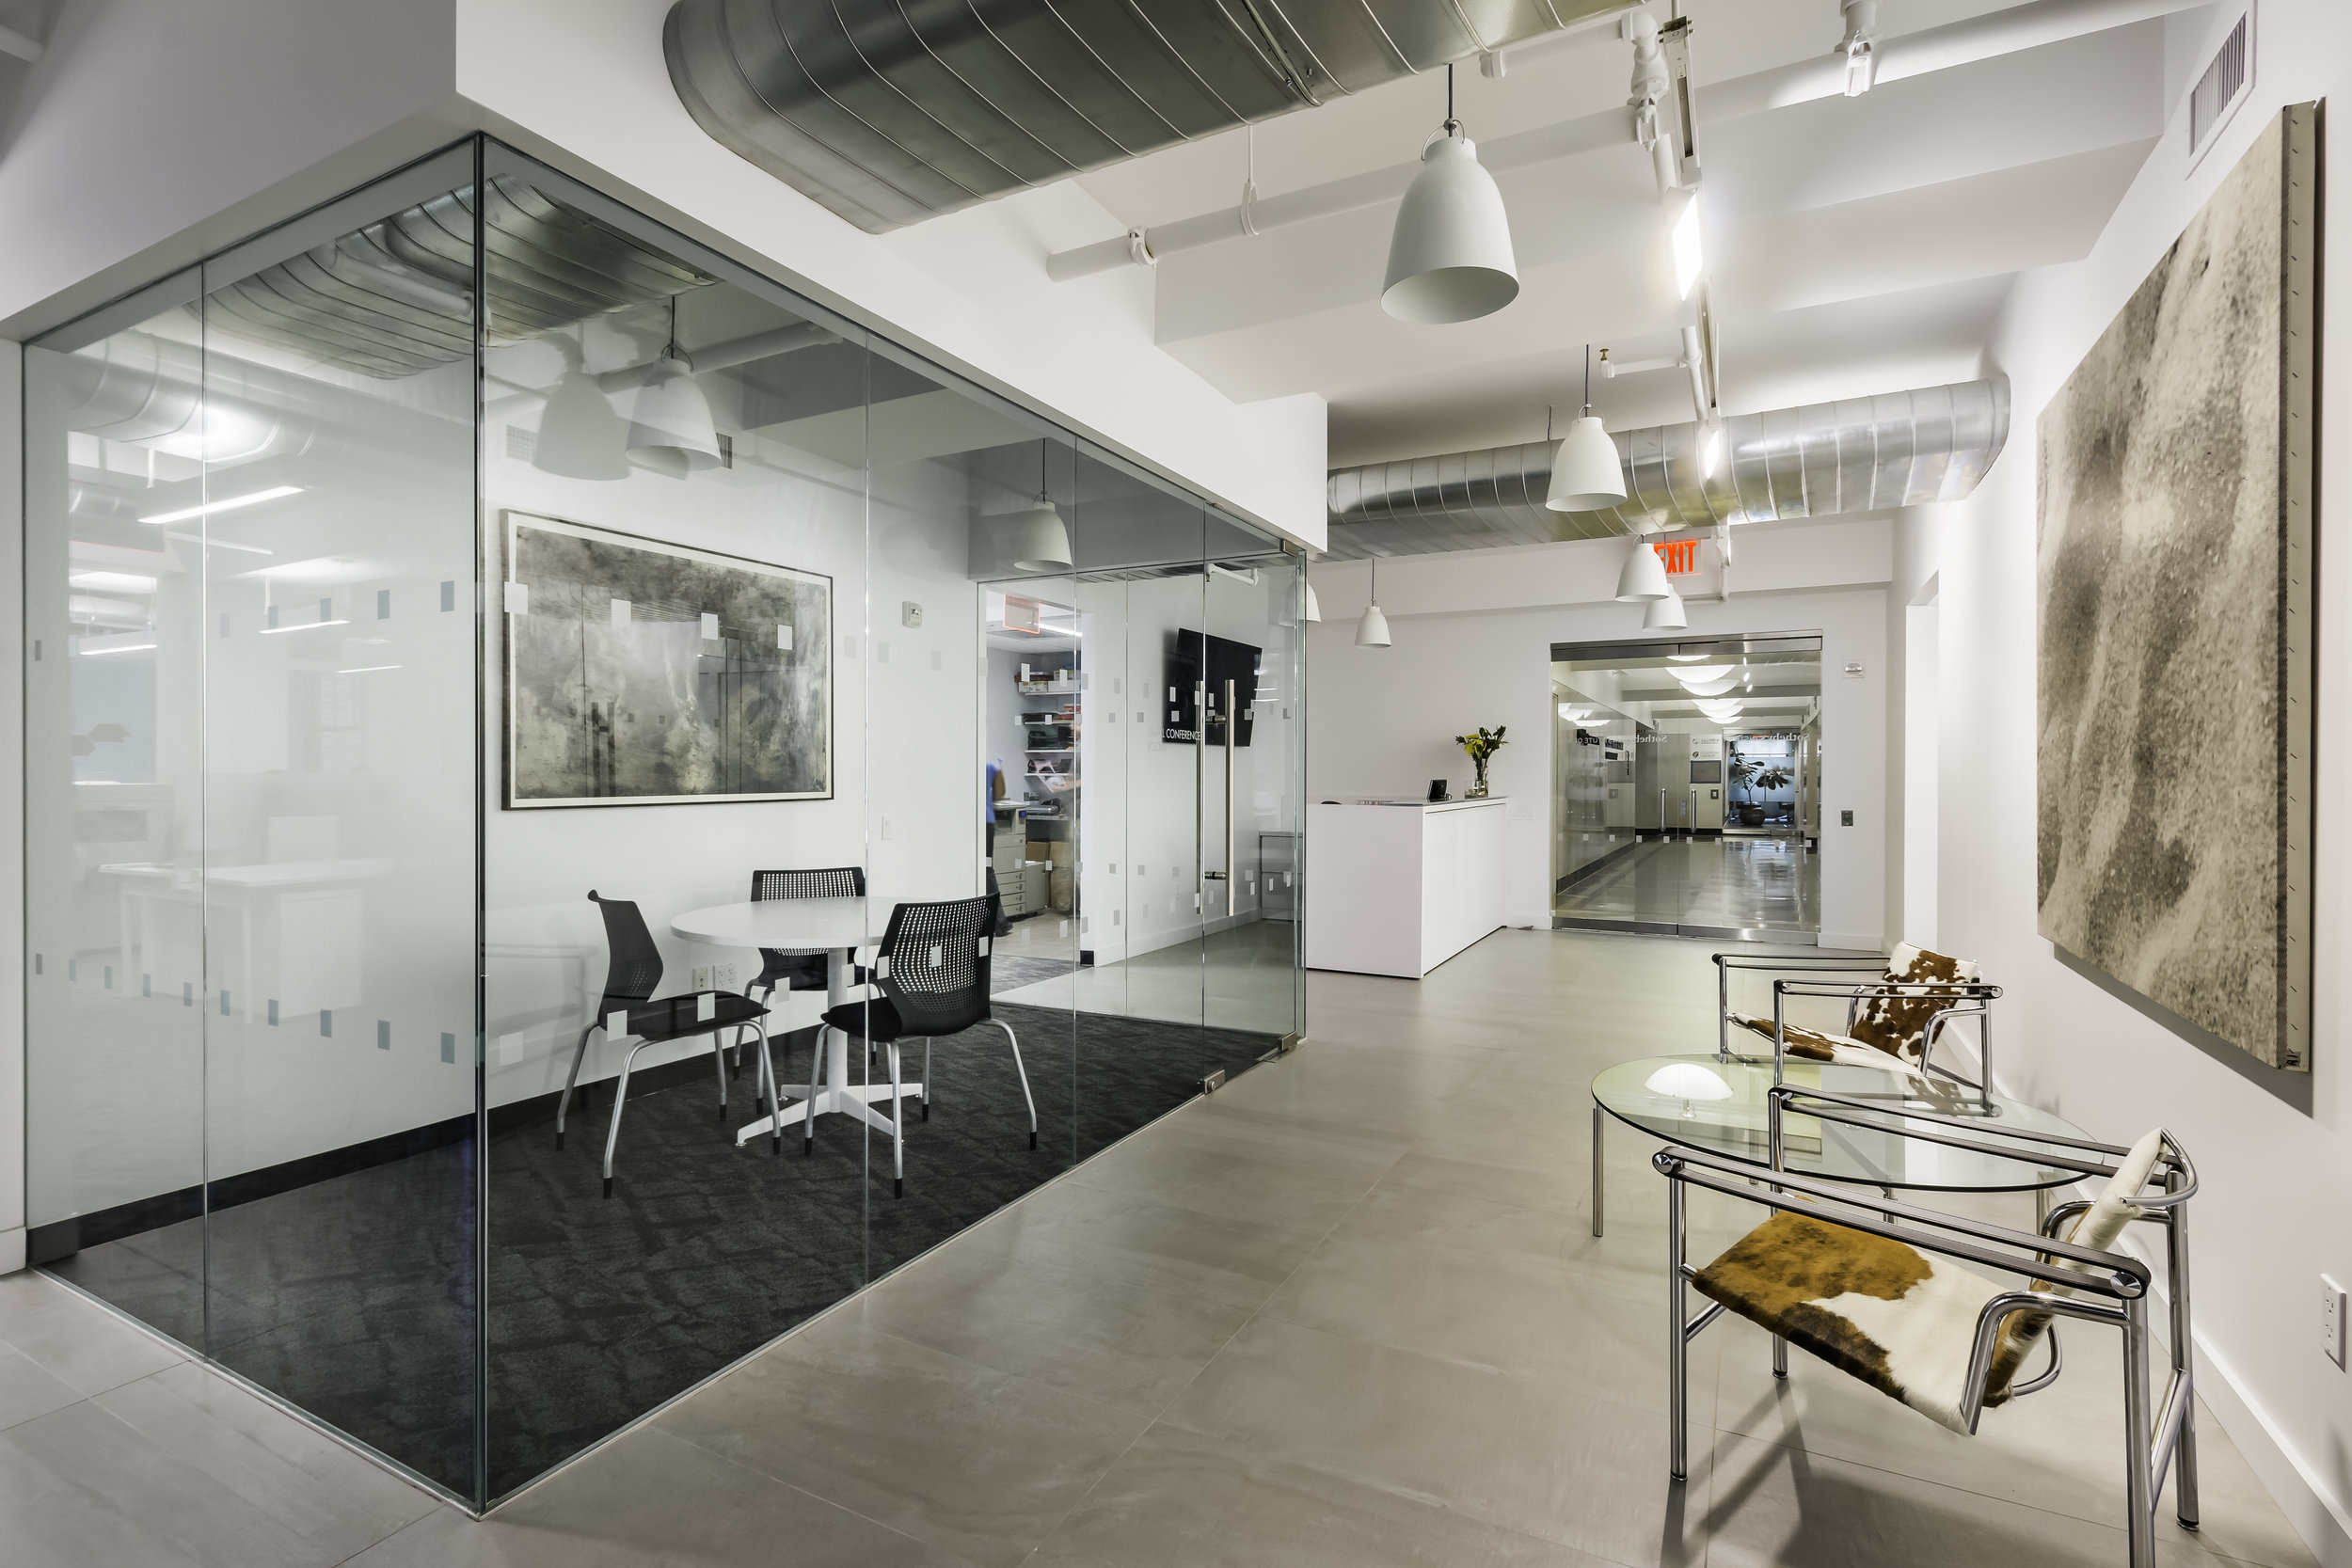 570 Lexington Avenue - New York CitySotheby's Institute of Art